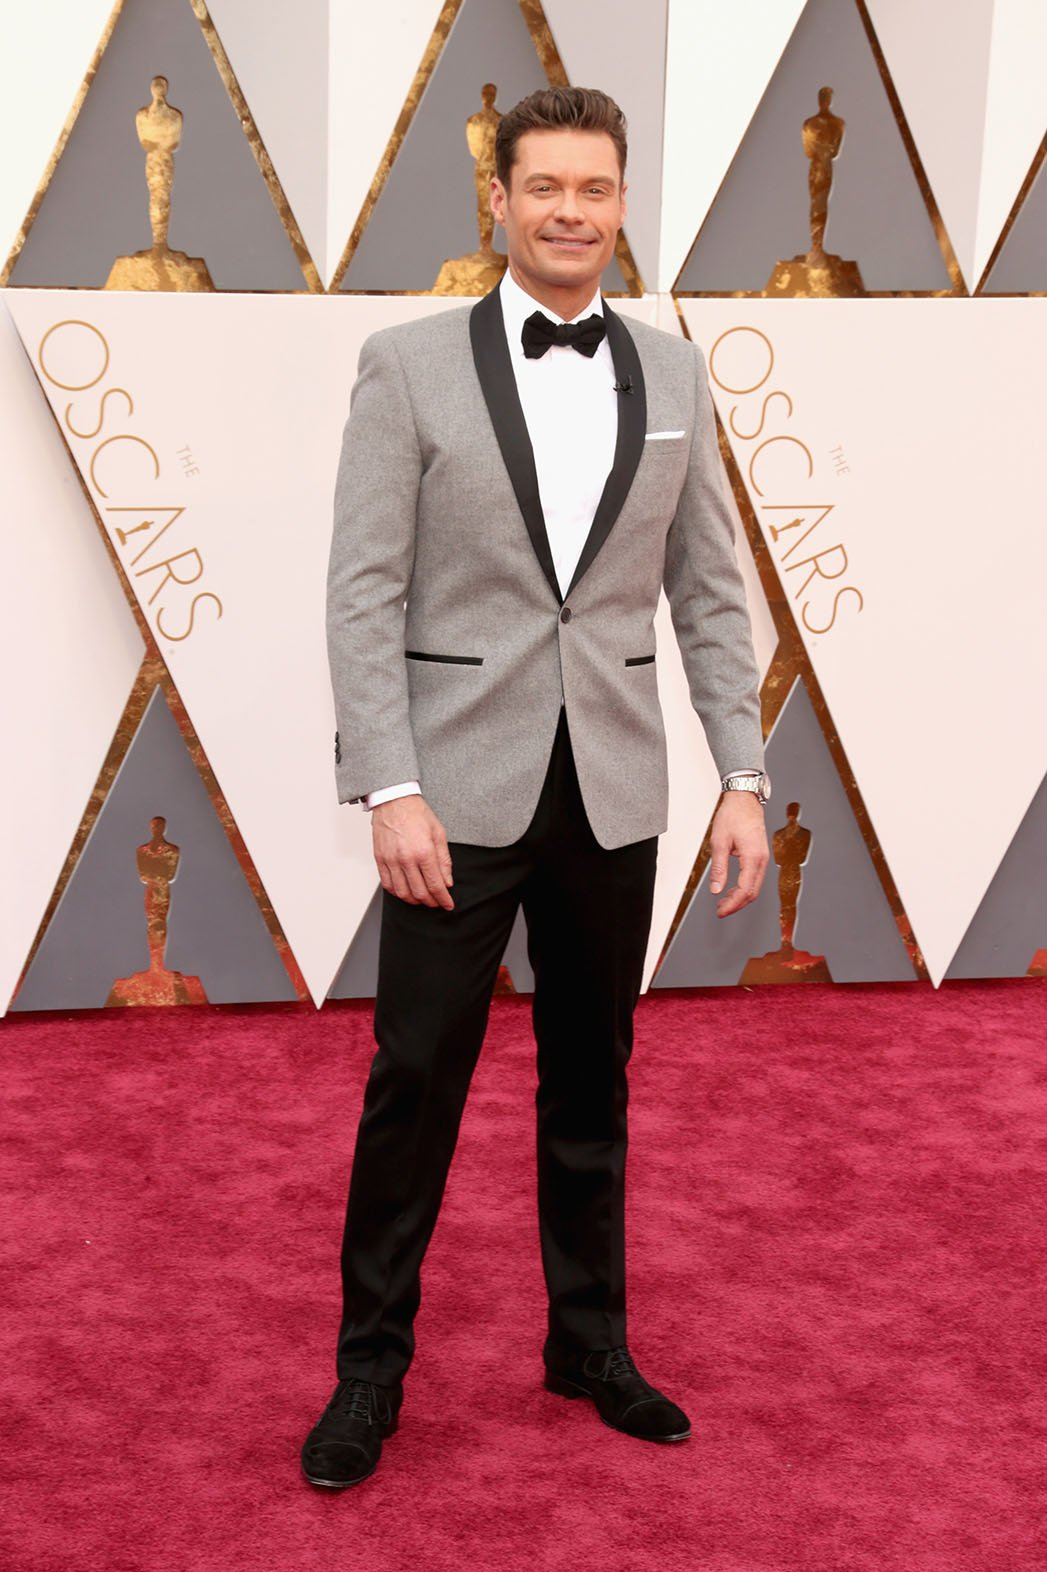 Ryan Seacrest Masculinos do Oscar 2016 Homens que se cuidam